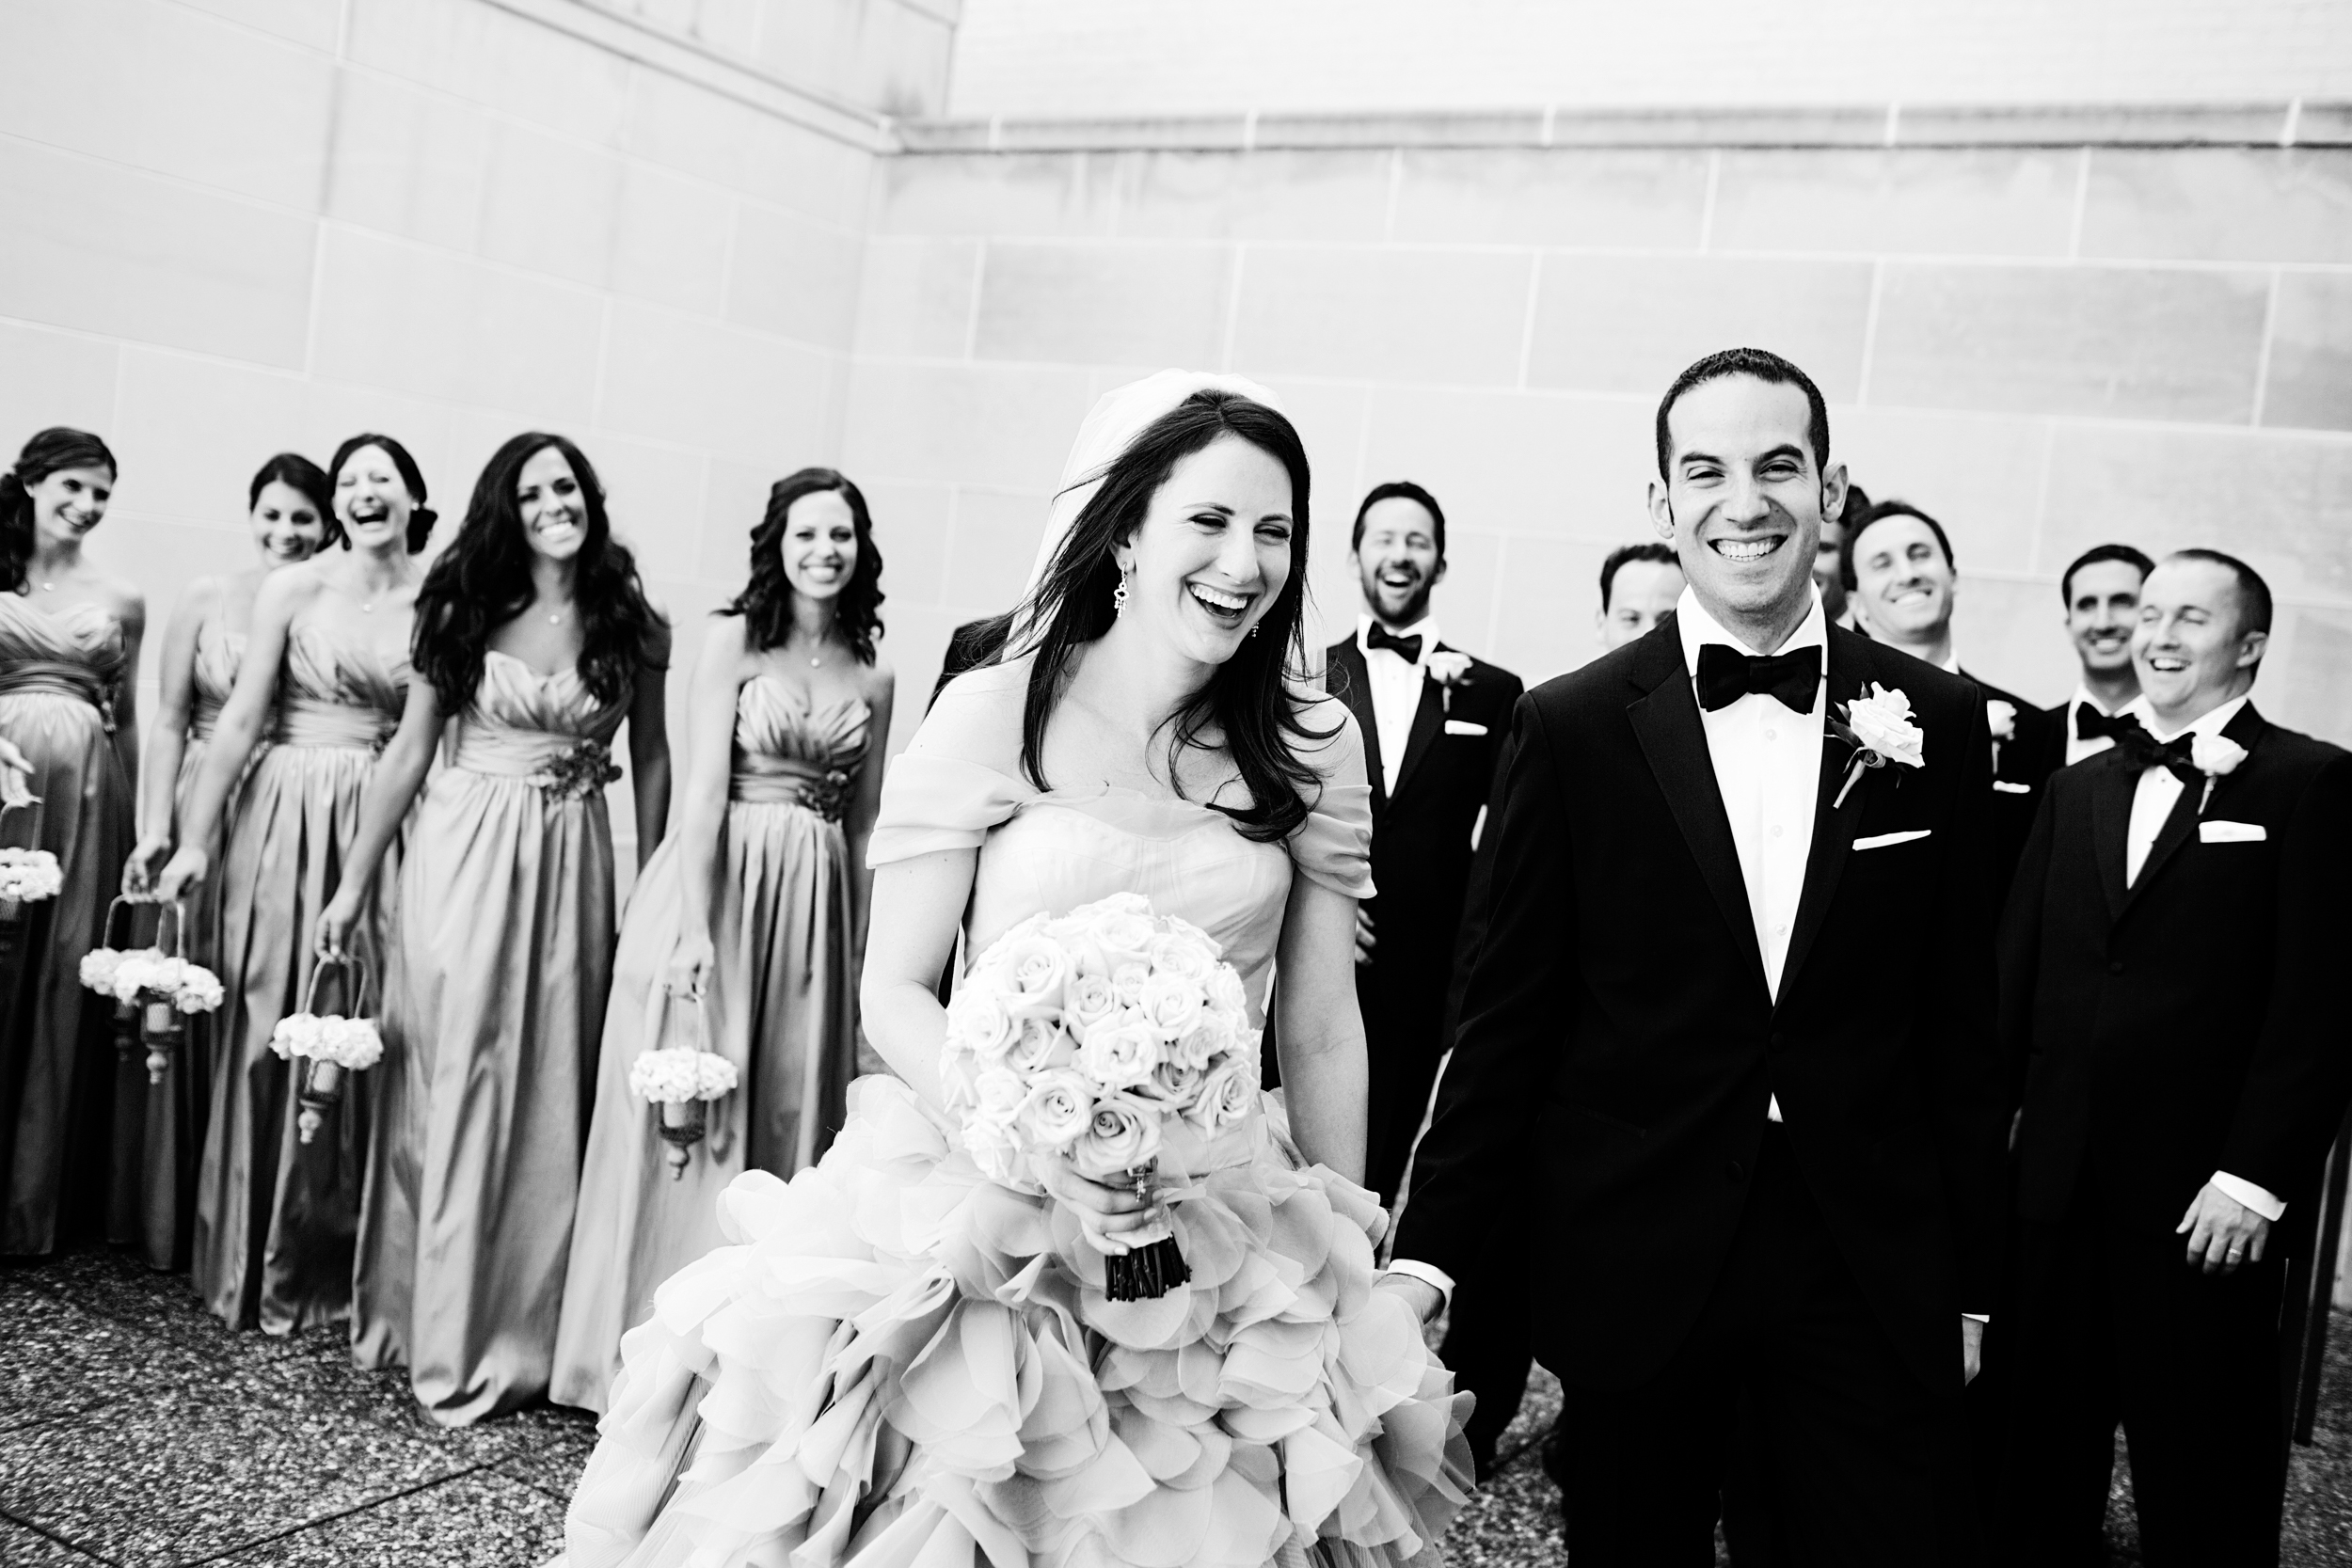 Ceci_New_York_Ceci_Style_Ceci_Johnson_Luxury_Lifestyle_Floral_Lace_Wedding_Letterpress_Inspiration_Design_Custom_Couture_Personalized_Invitations_-77.jpg